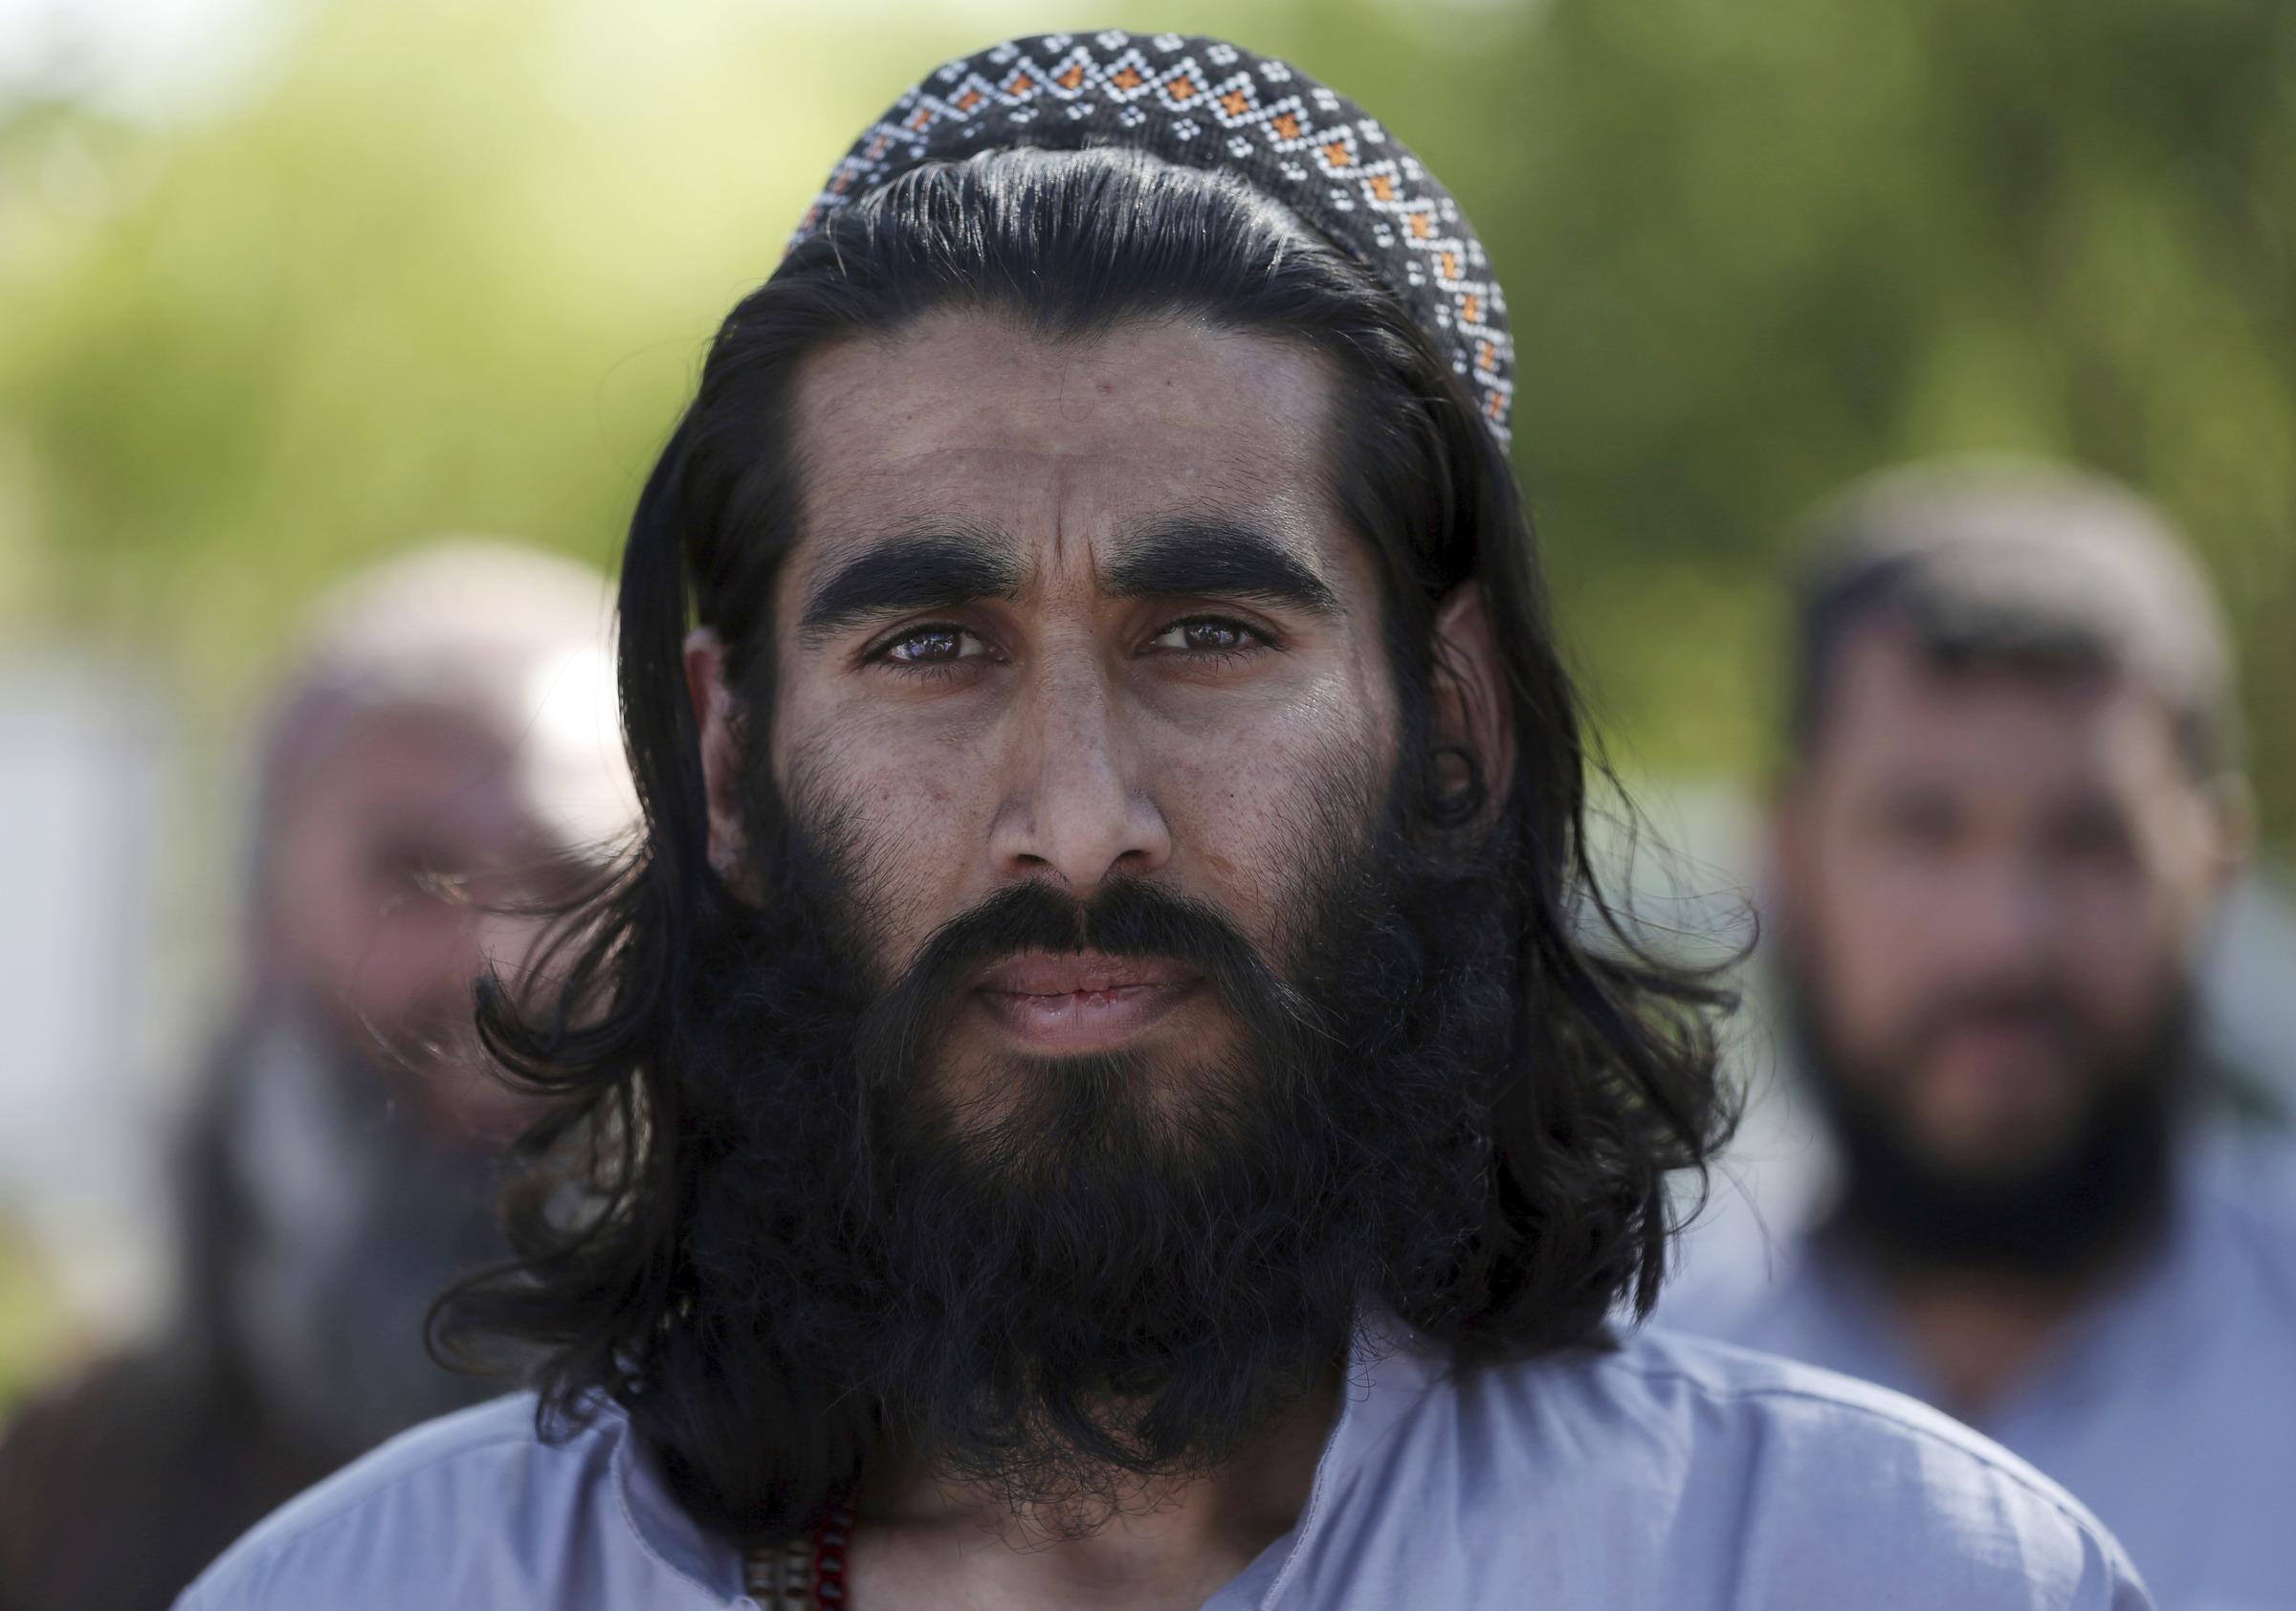 Chi sono i Talebani